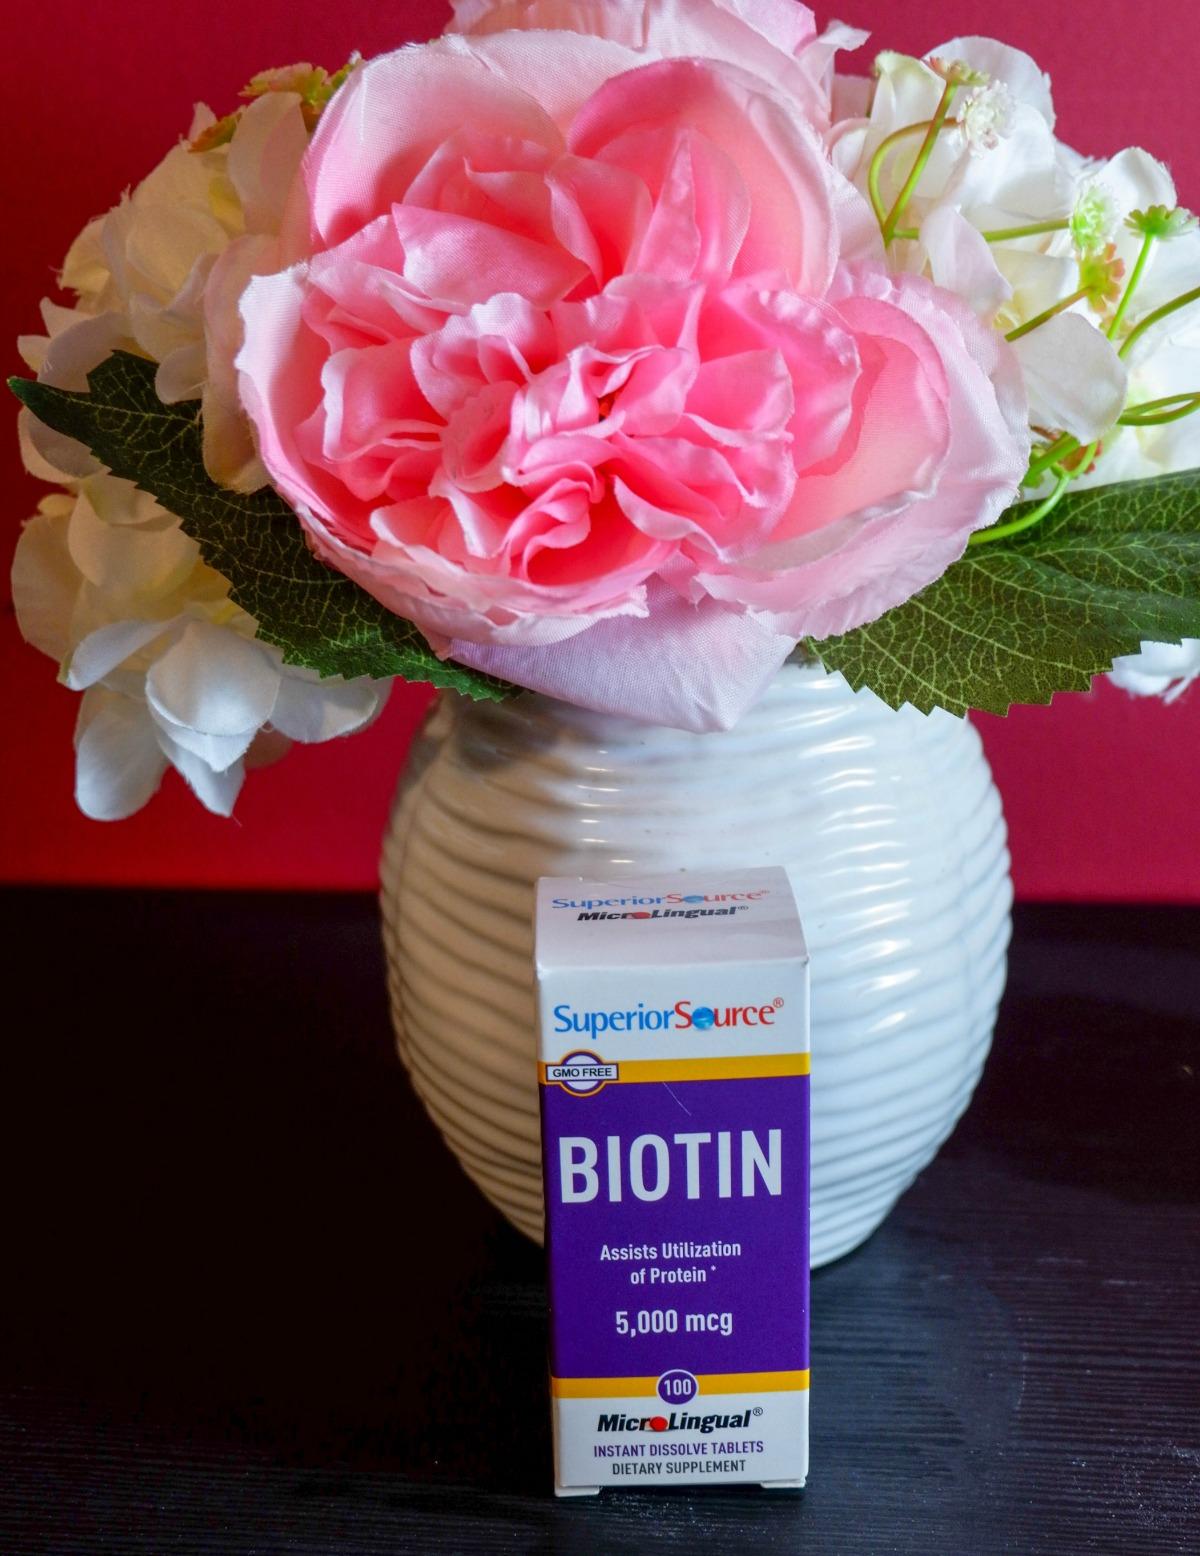 Superior Source Vitamins biotin